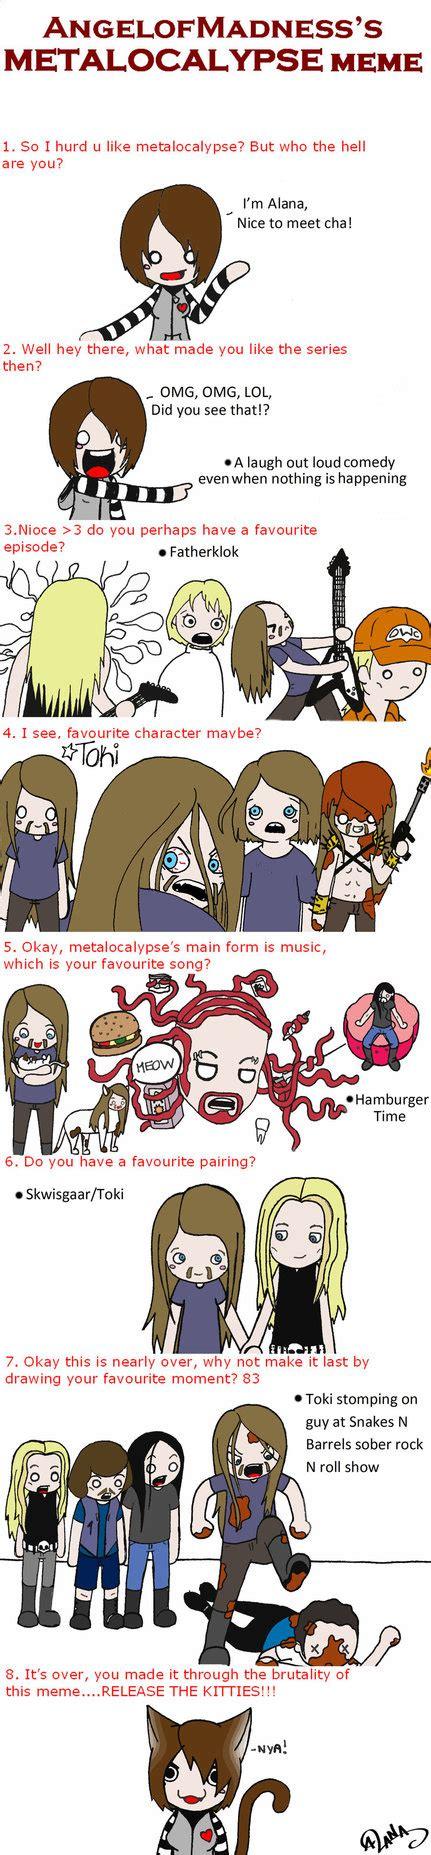 Metalocalypse Meme - metalocalypse meme by eparnam on deviantart